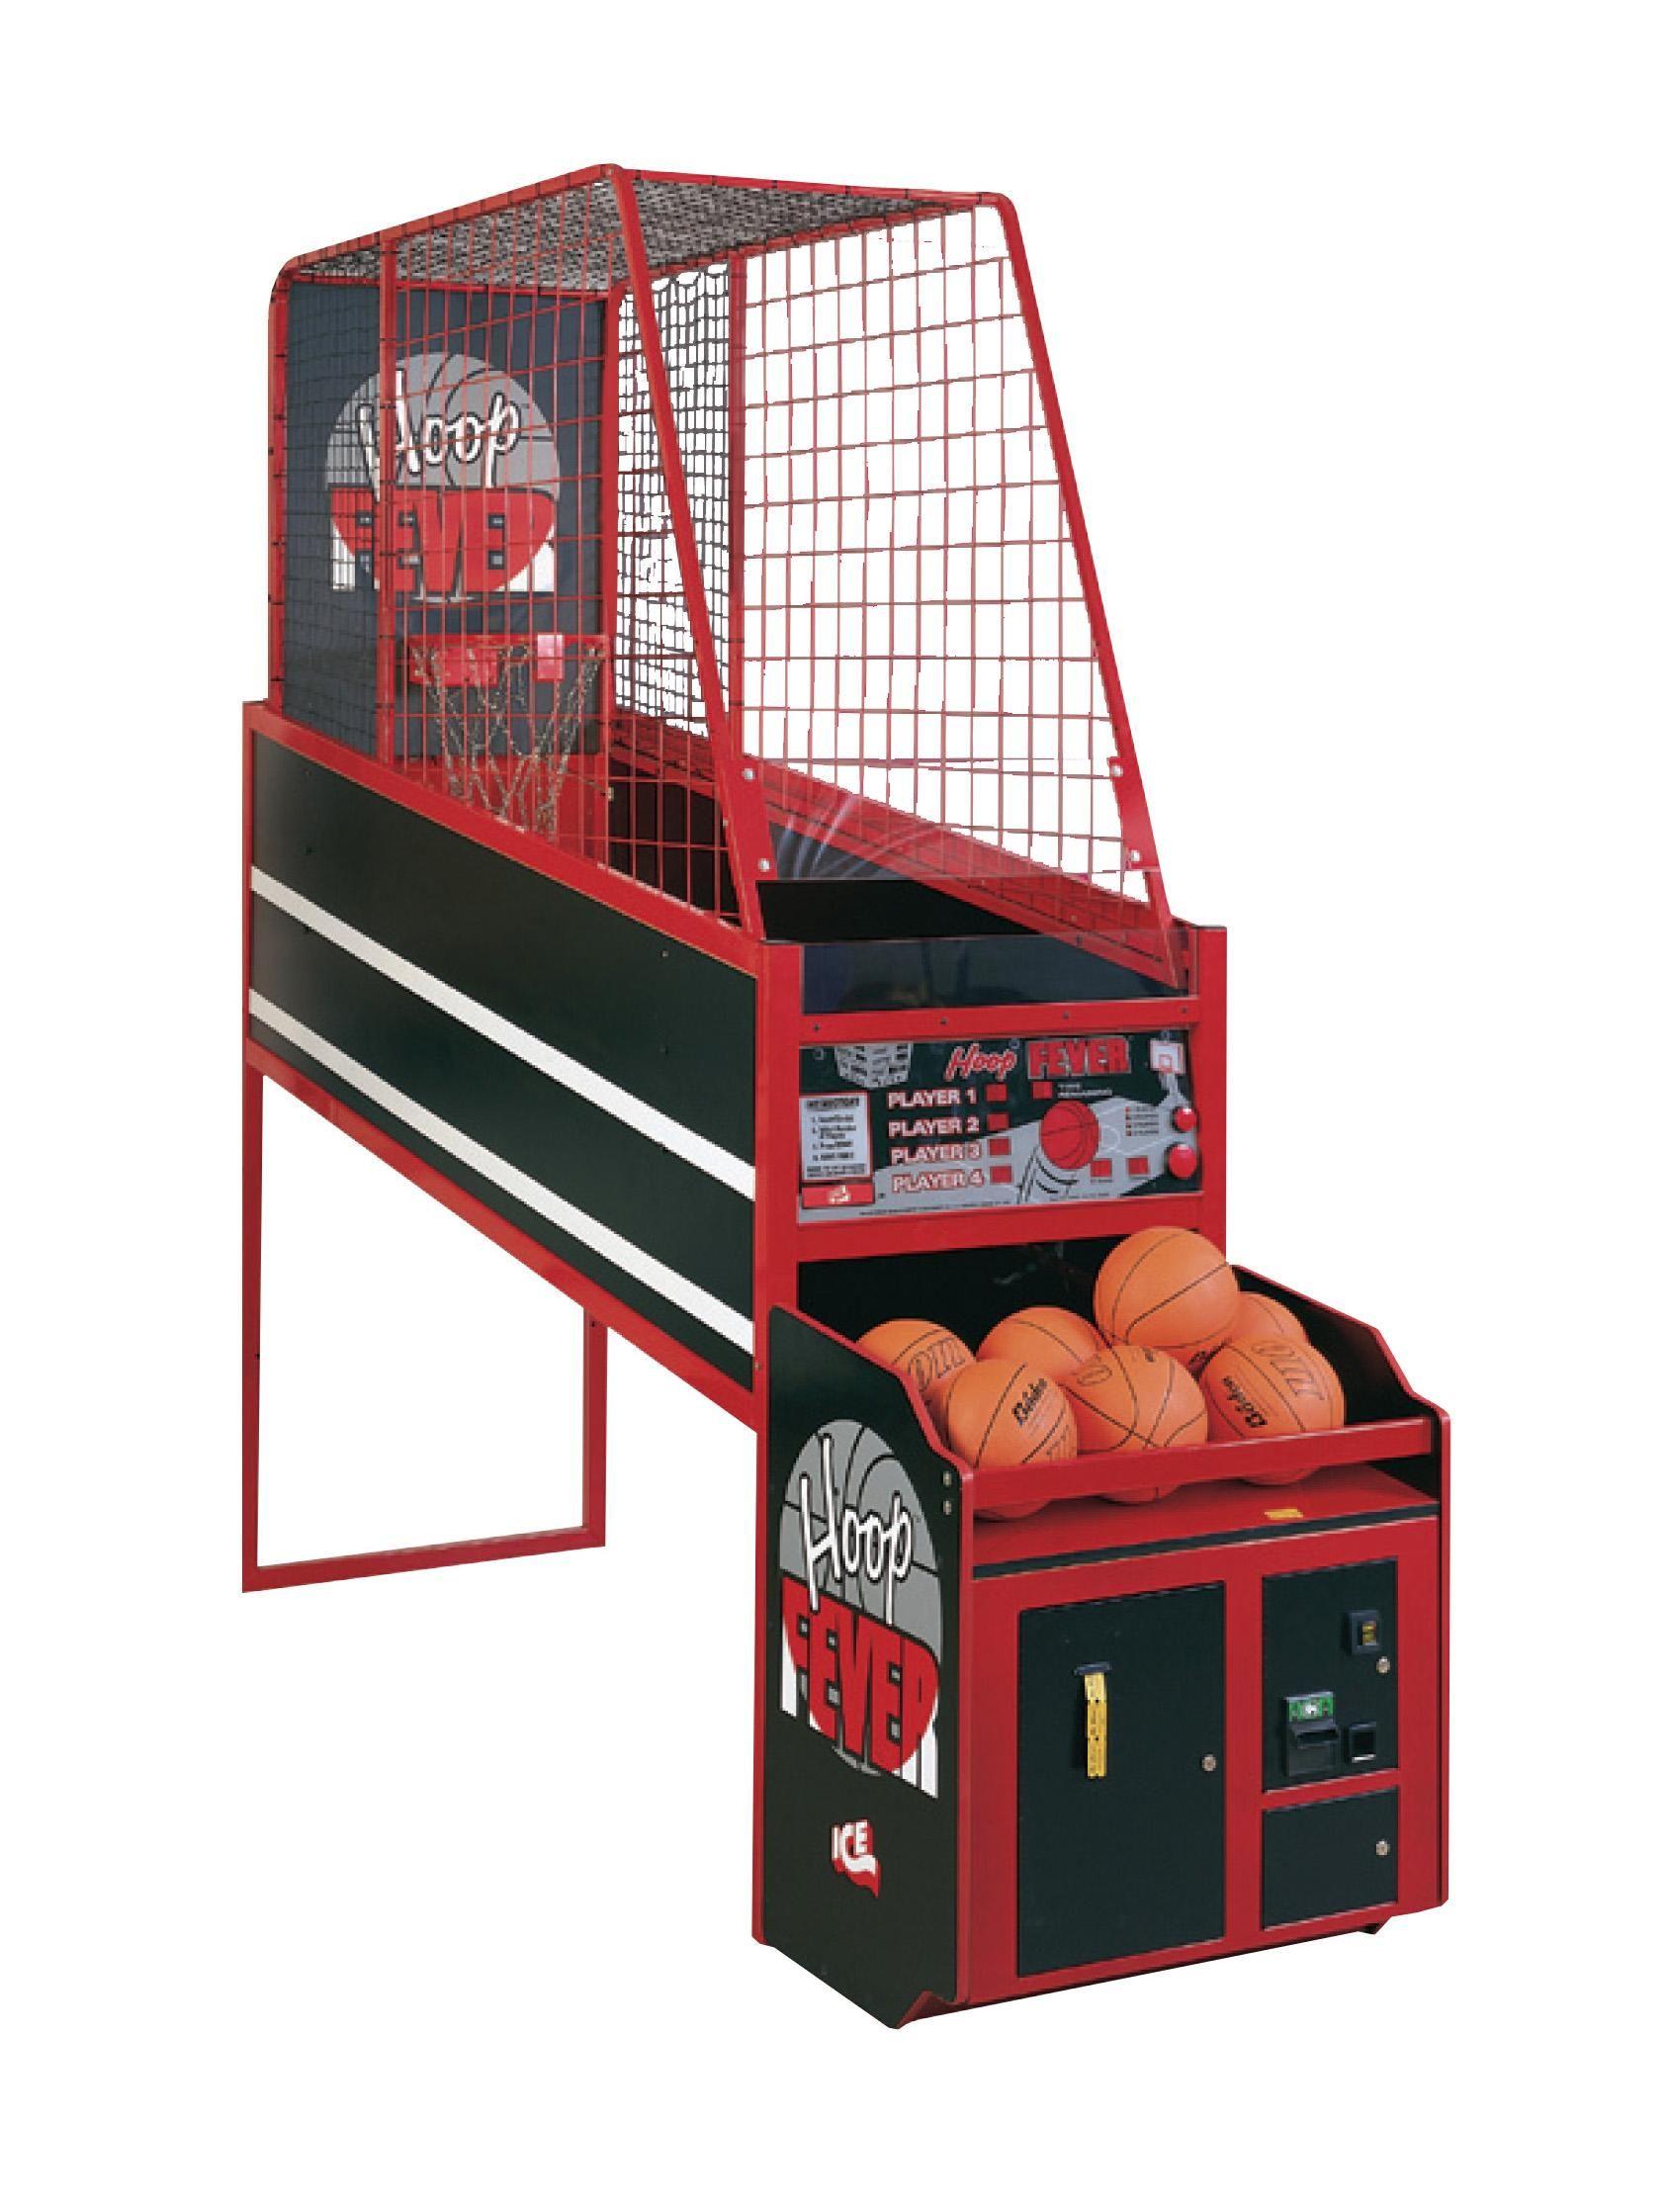 Basketball Arcade Machine Google Search Basketball Arcade Games Arcade Basketball Arcade Games